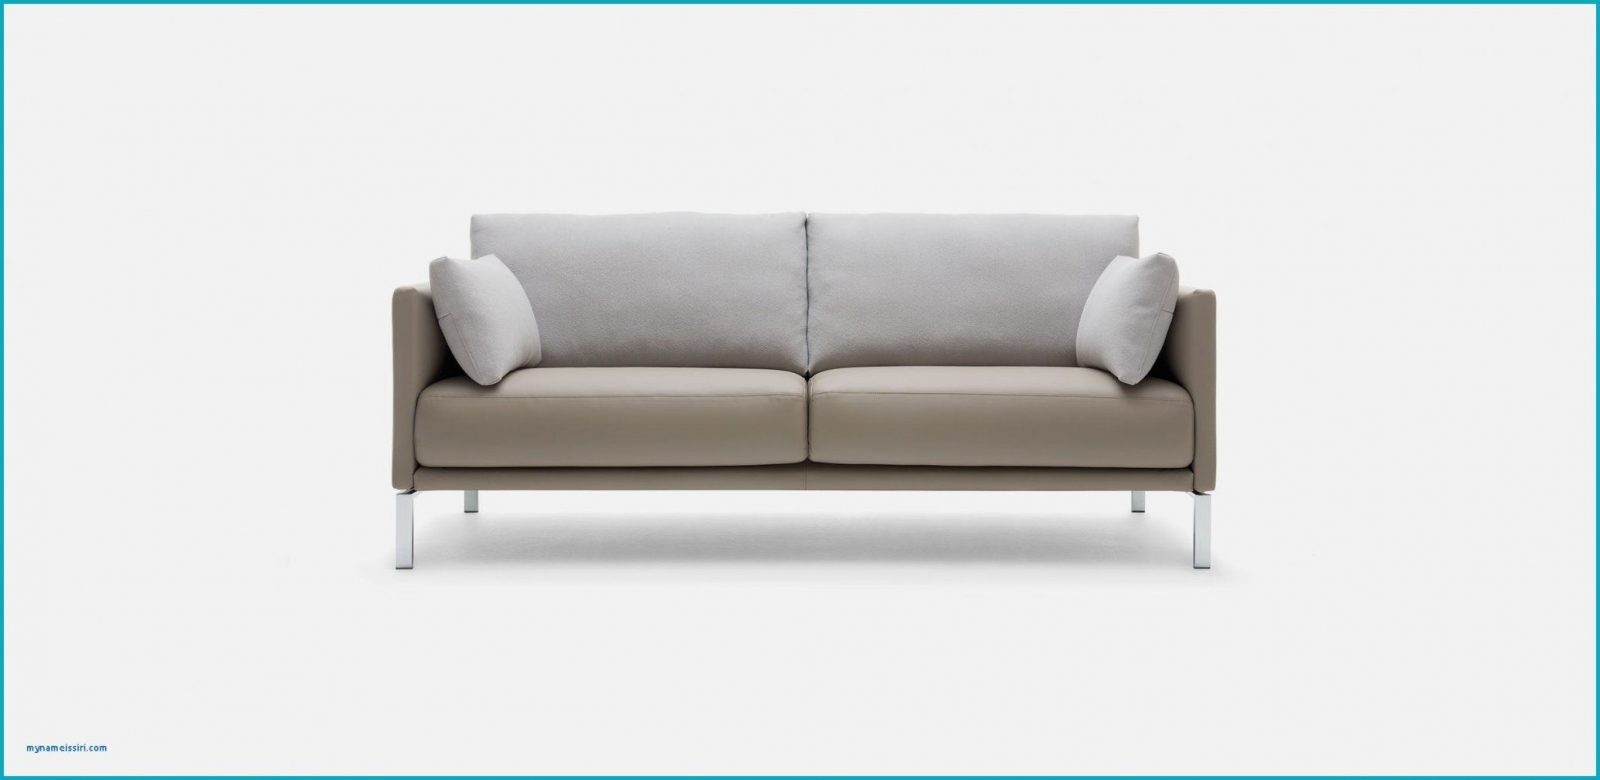 Couch Auf Raten Als Neukunde Elegant Sofa Auf Raten Kaufen Als von Couch Auf Raten Als Neukunde Photo